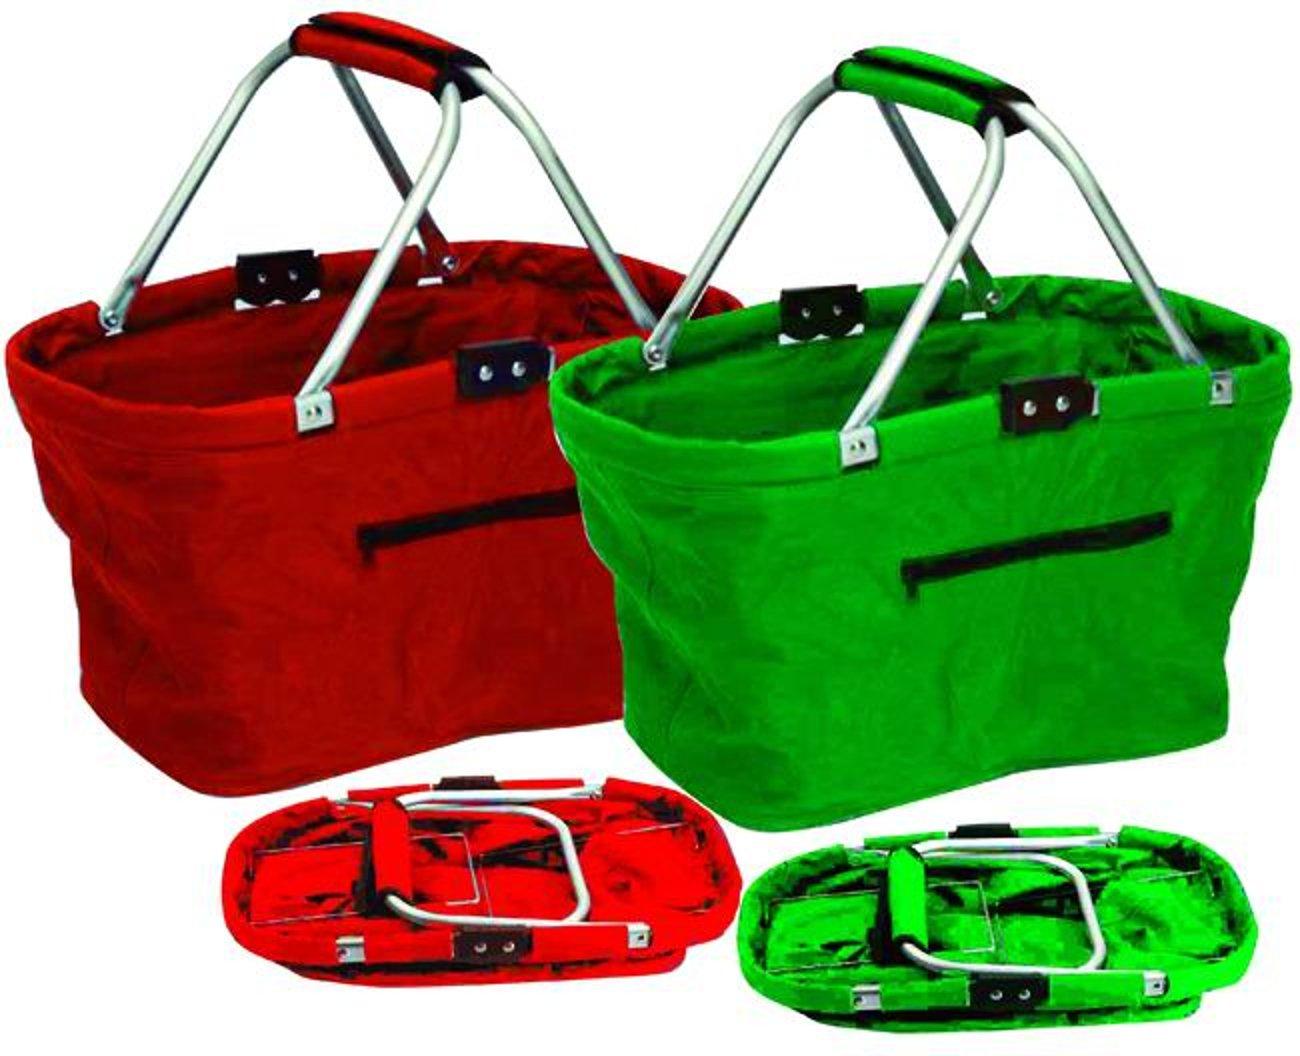 Berni 9666305 Zusammenklappbarer Einkaufskorb, Modell Baggy-Bag Sortiert.